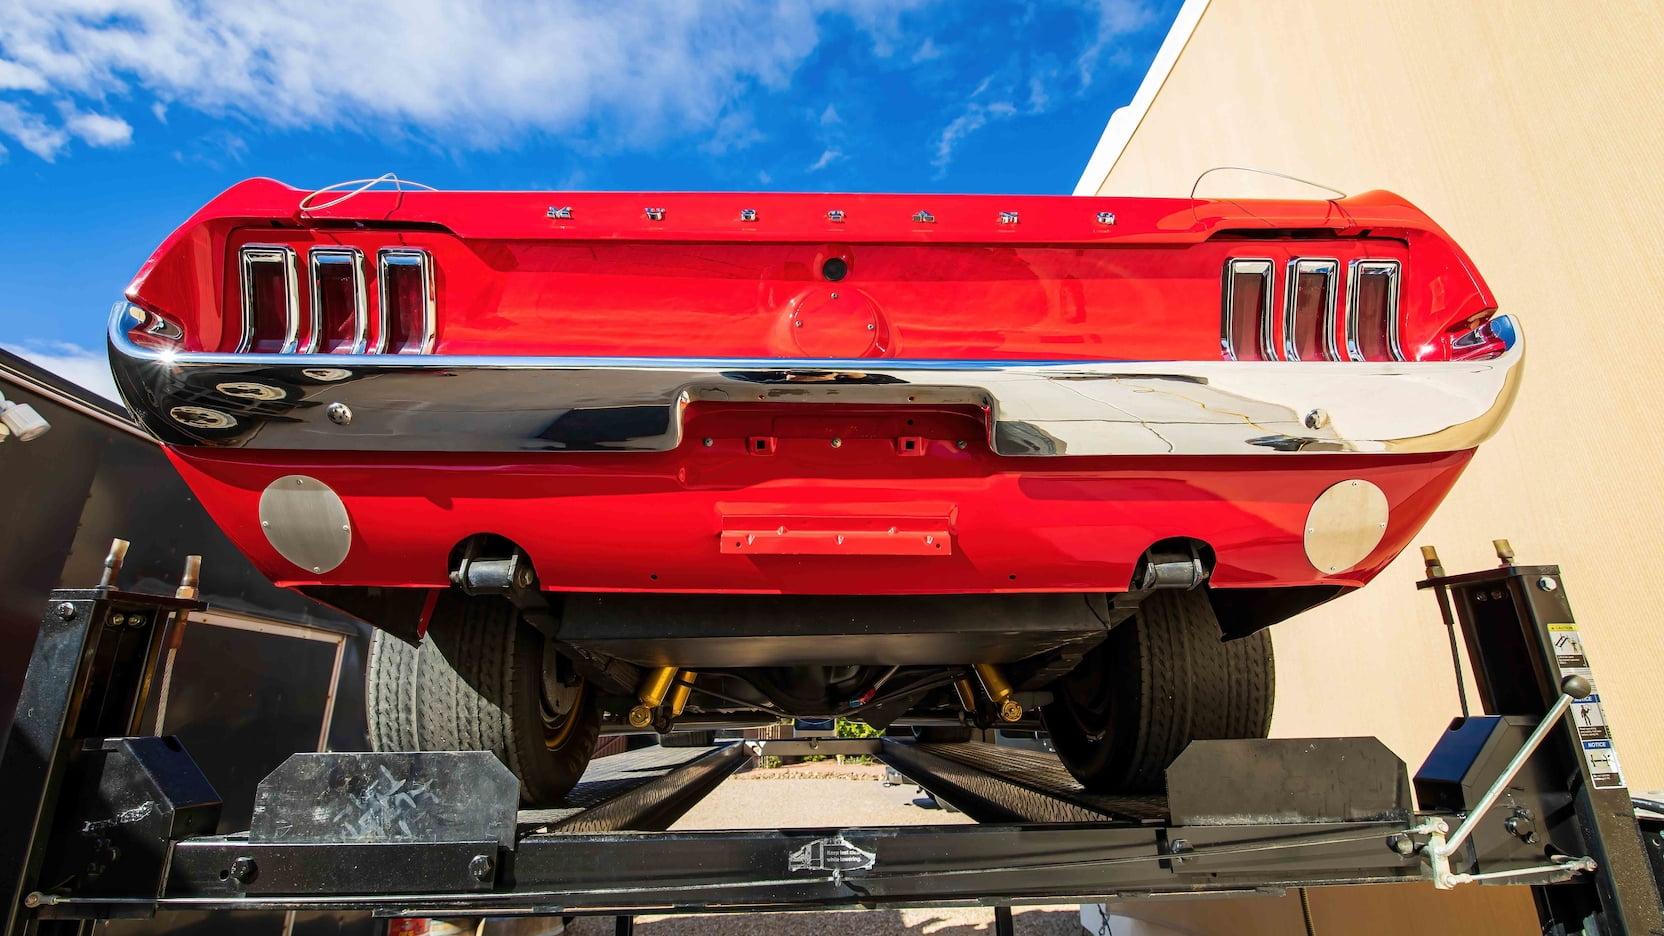 1967 Ford Mustang Holman-Moody Racer rear